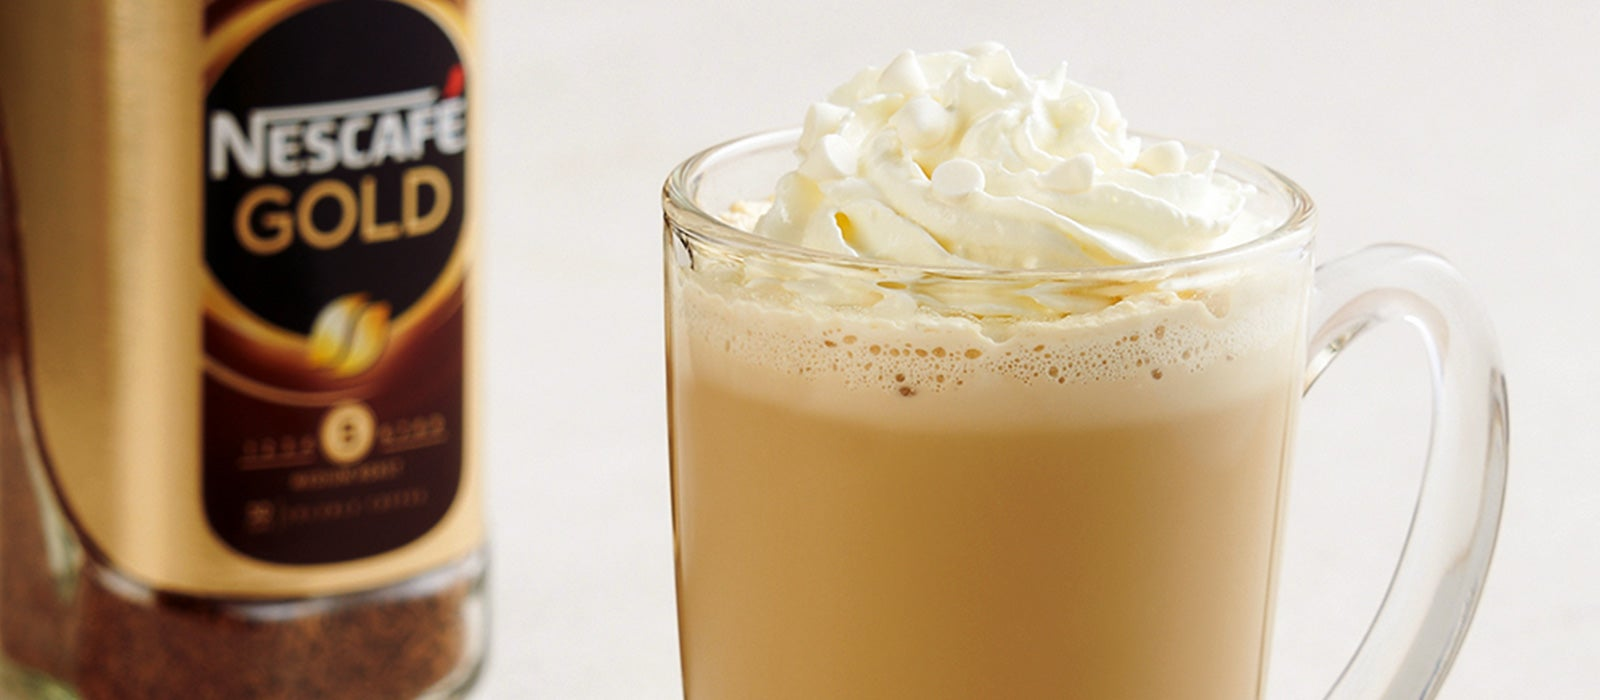 nescafe-gold-white-chocolate-mocha-recipe-banner_0.jpg